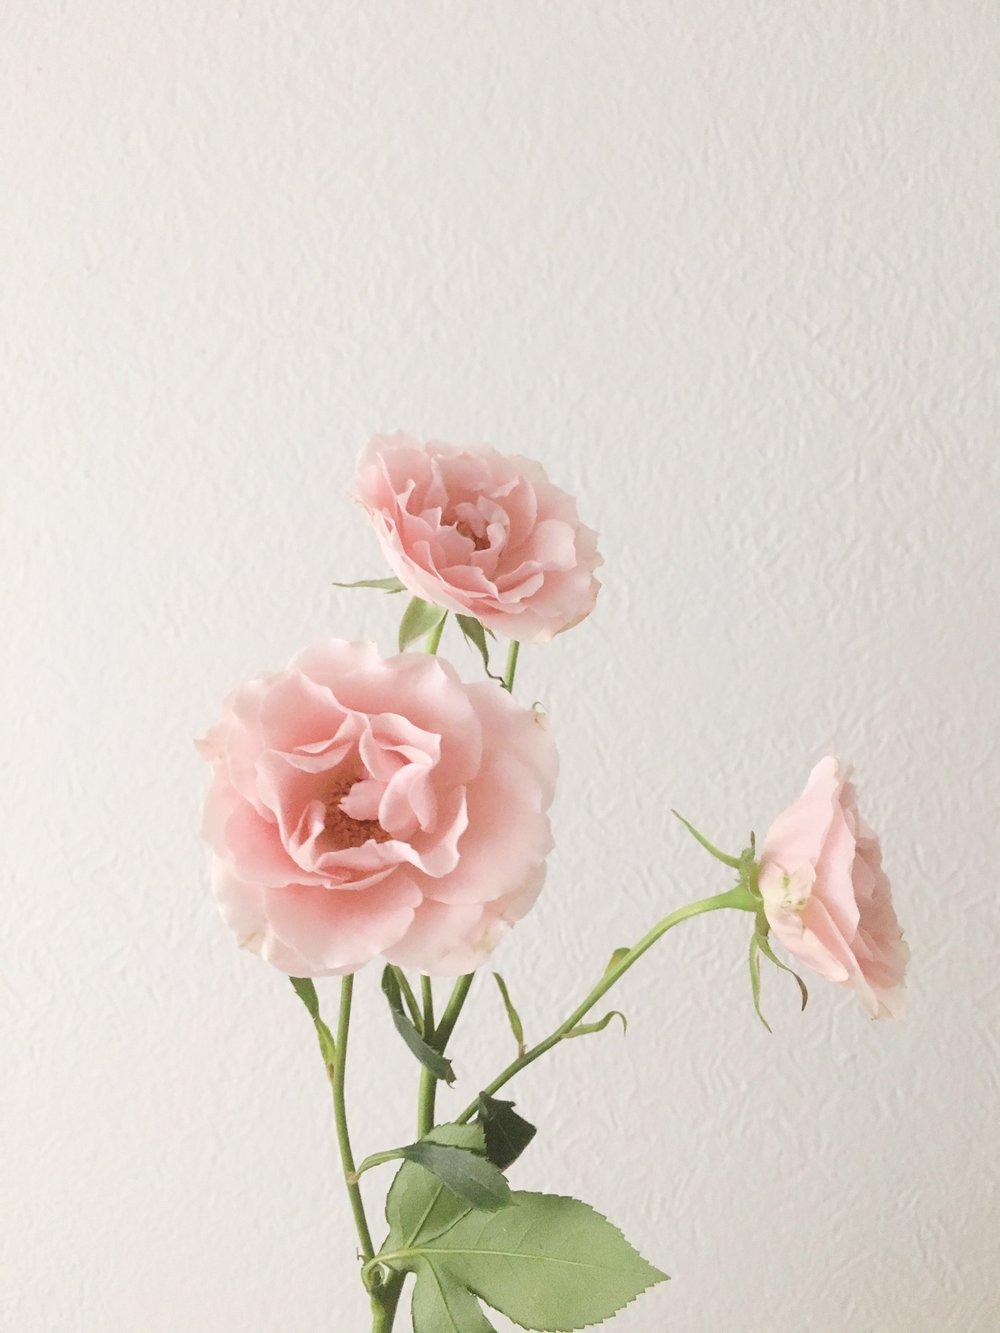 PINK MAJOLICA SPRAY ROSE